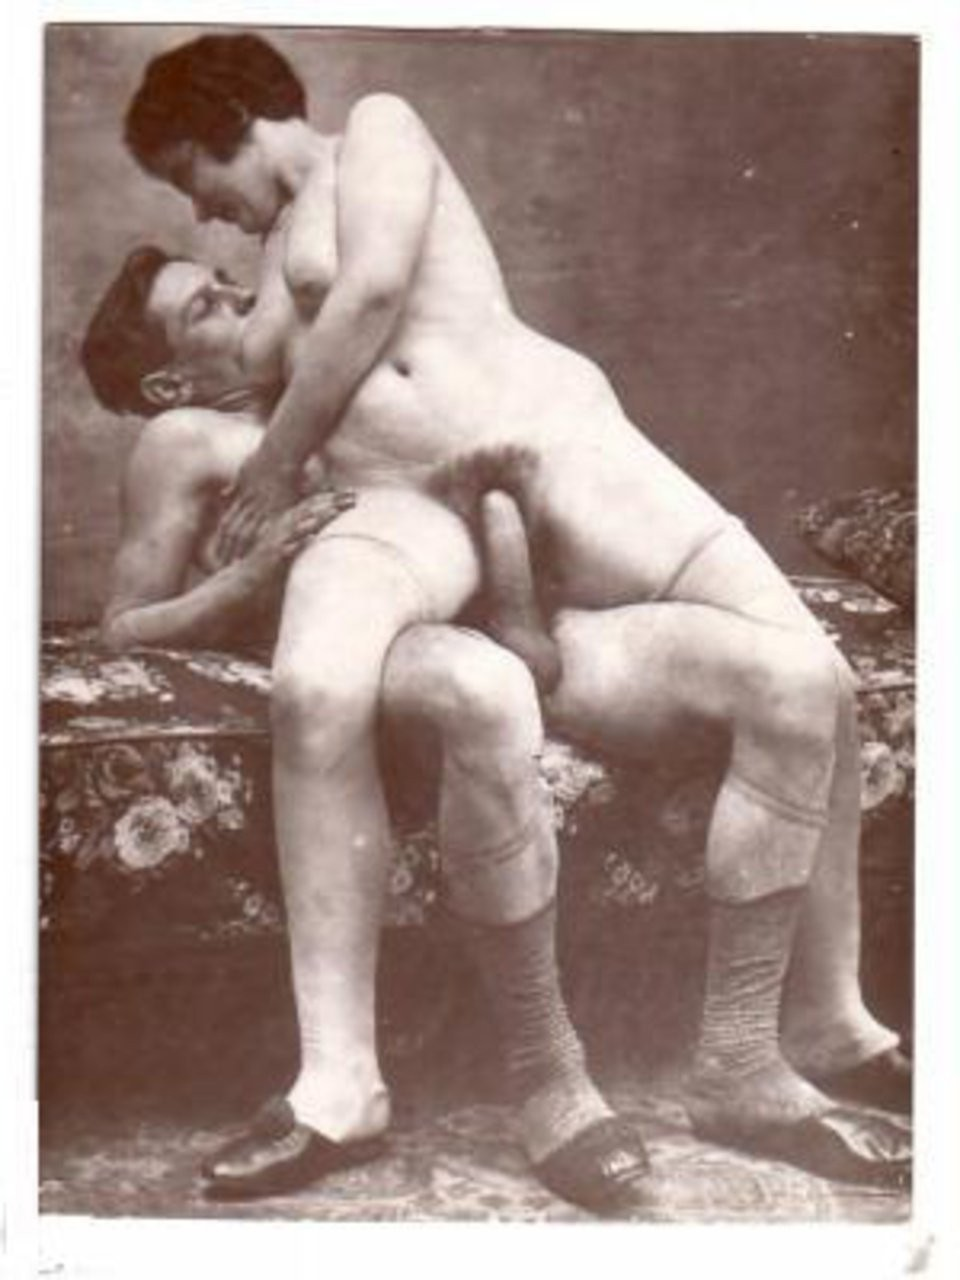 sex in the break room – Strumpfhose